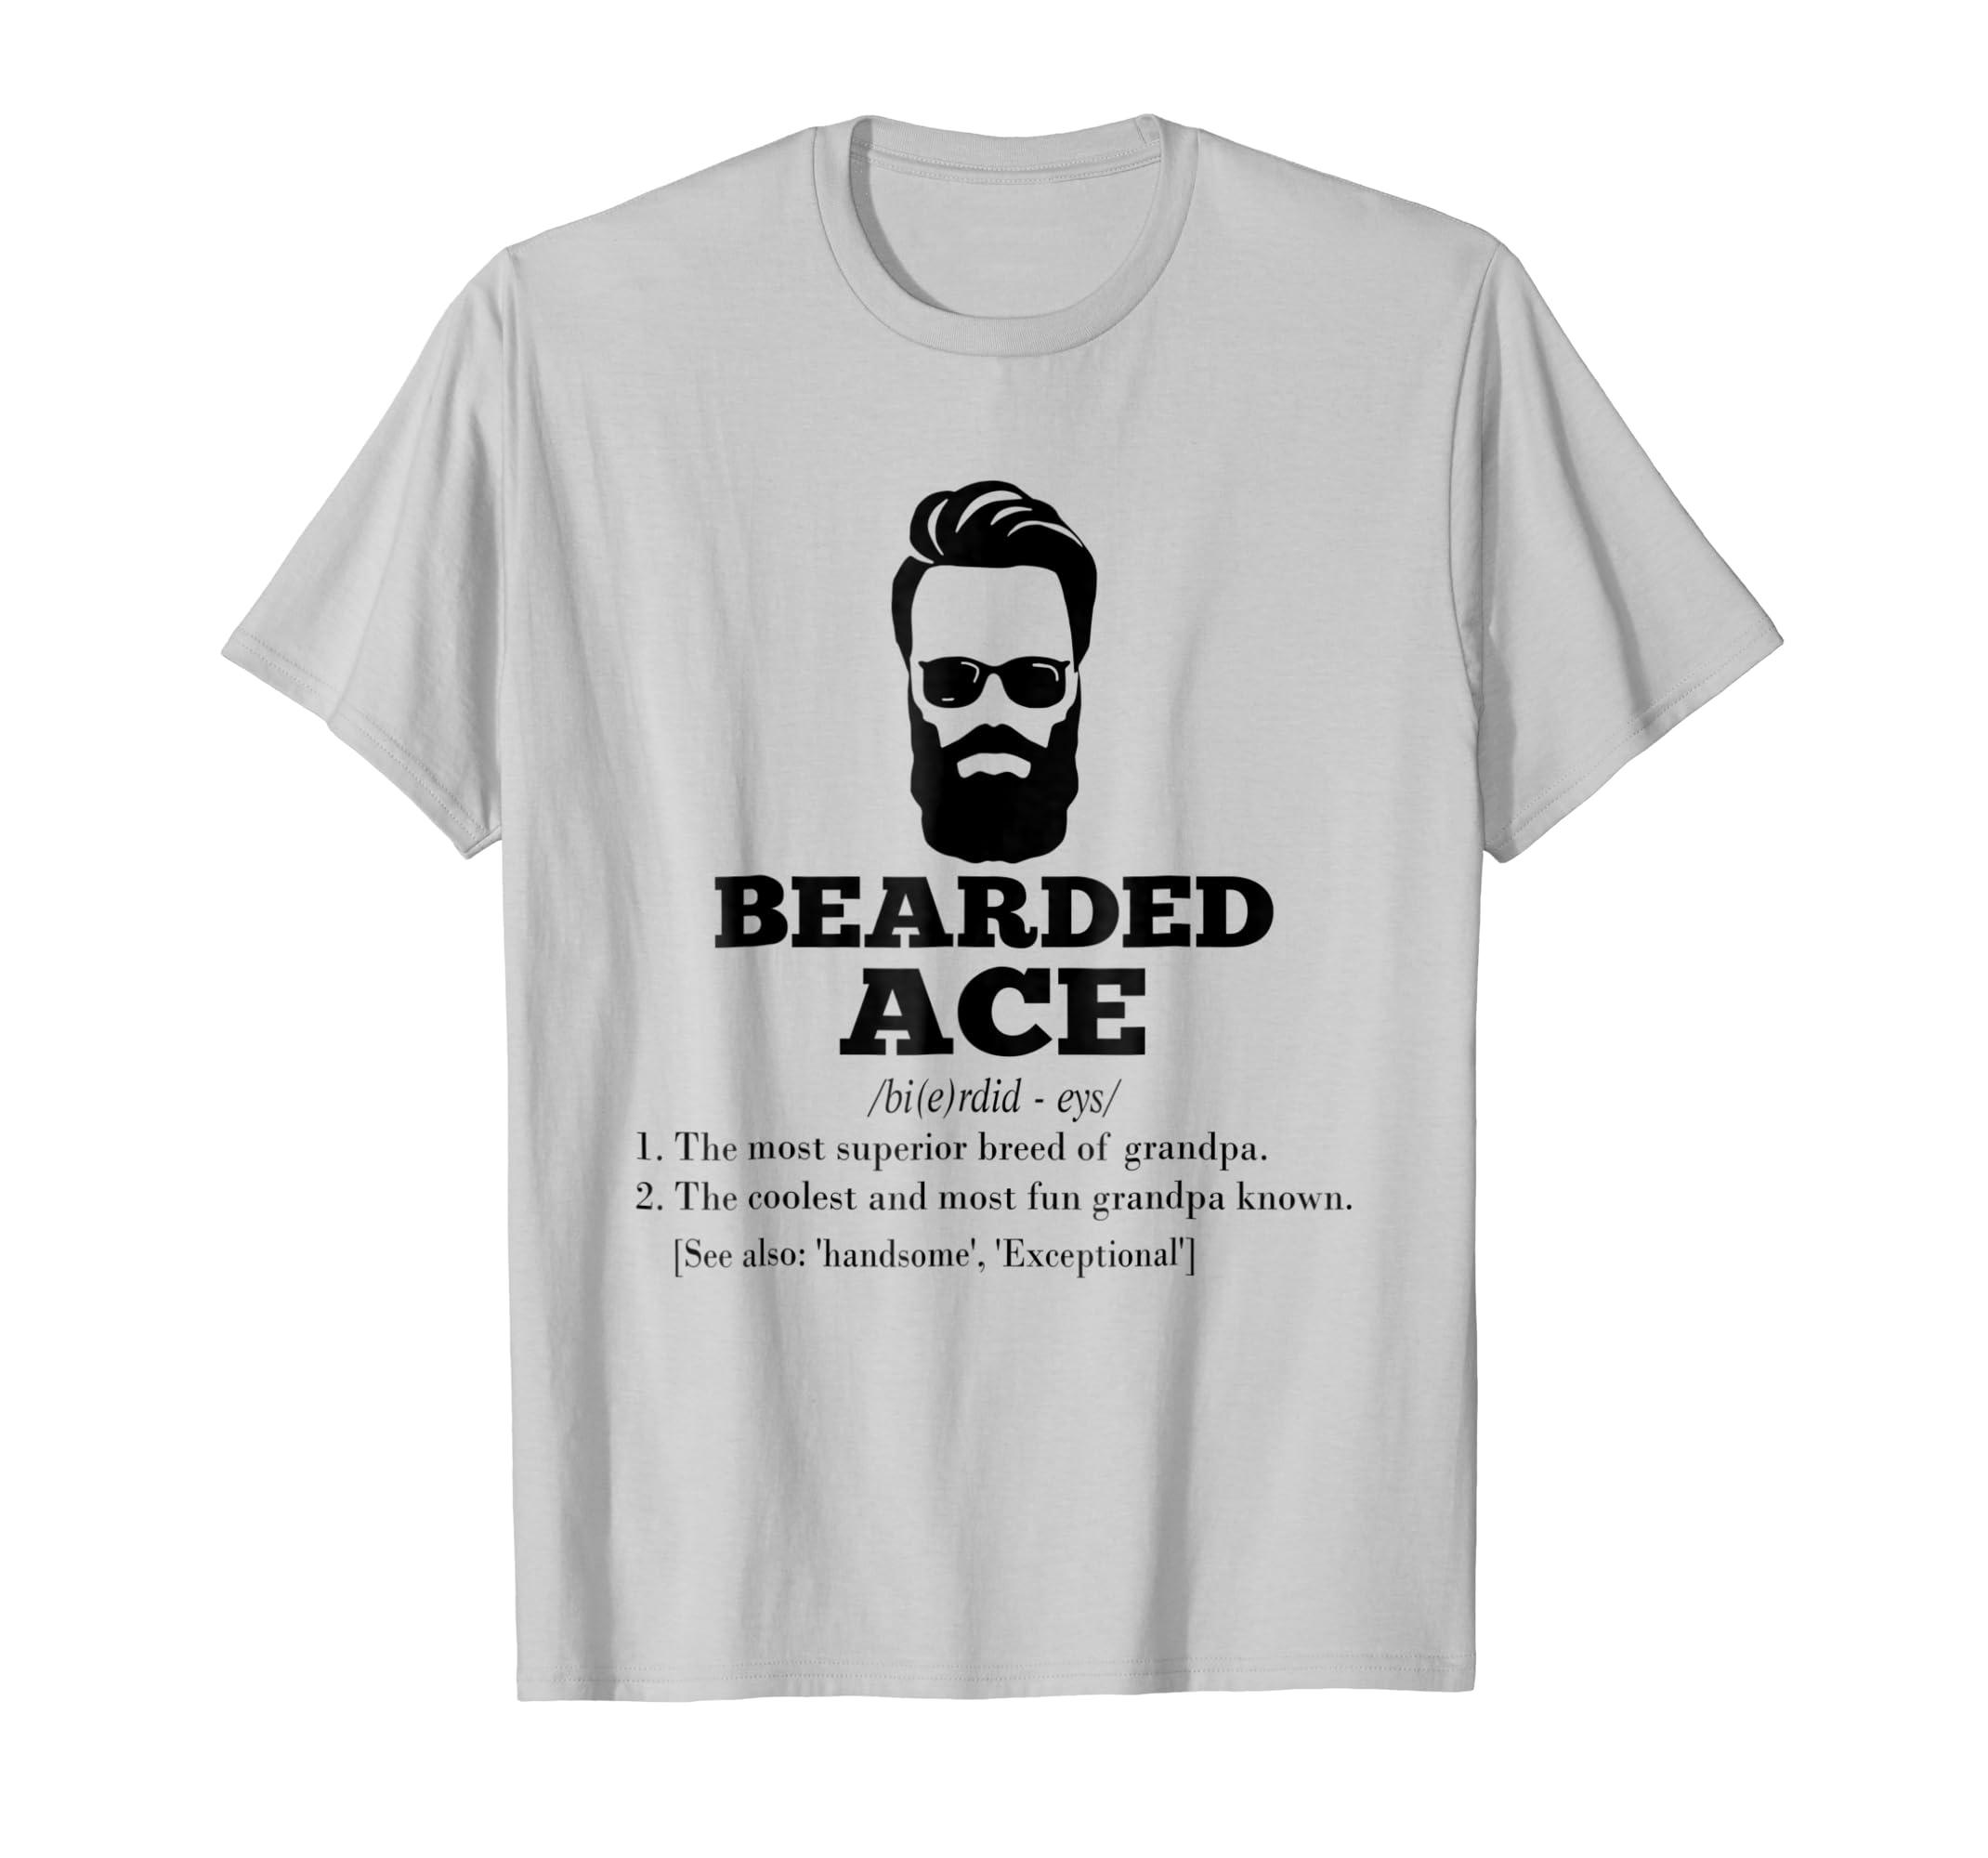 bbfb407309 Amazon.com  Mens Bearded ACE Tshirt  Clothing